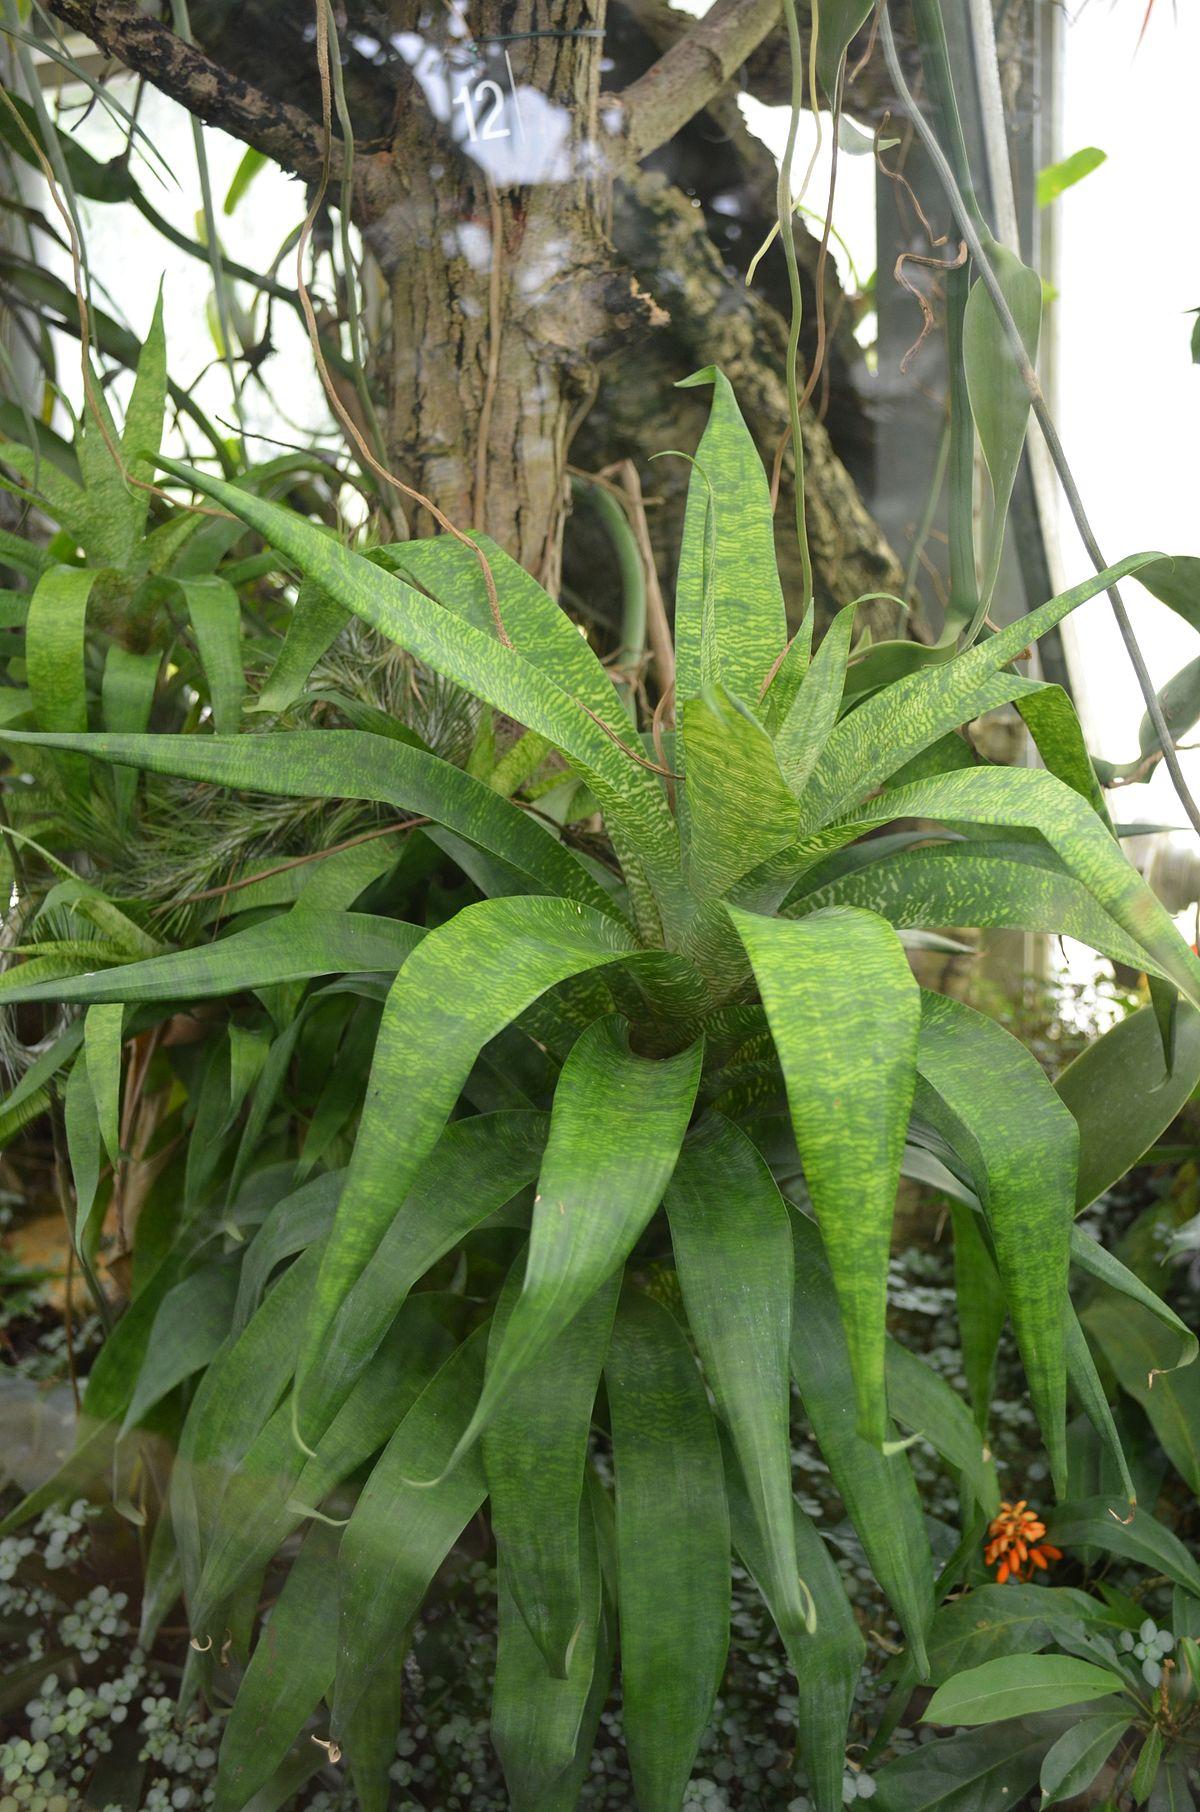 Guzmania subcorymbosa wikidata - Jardin botanique de lyon ...